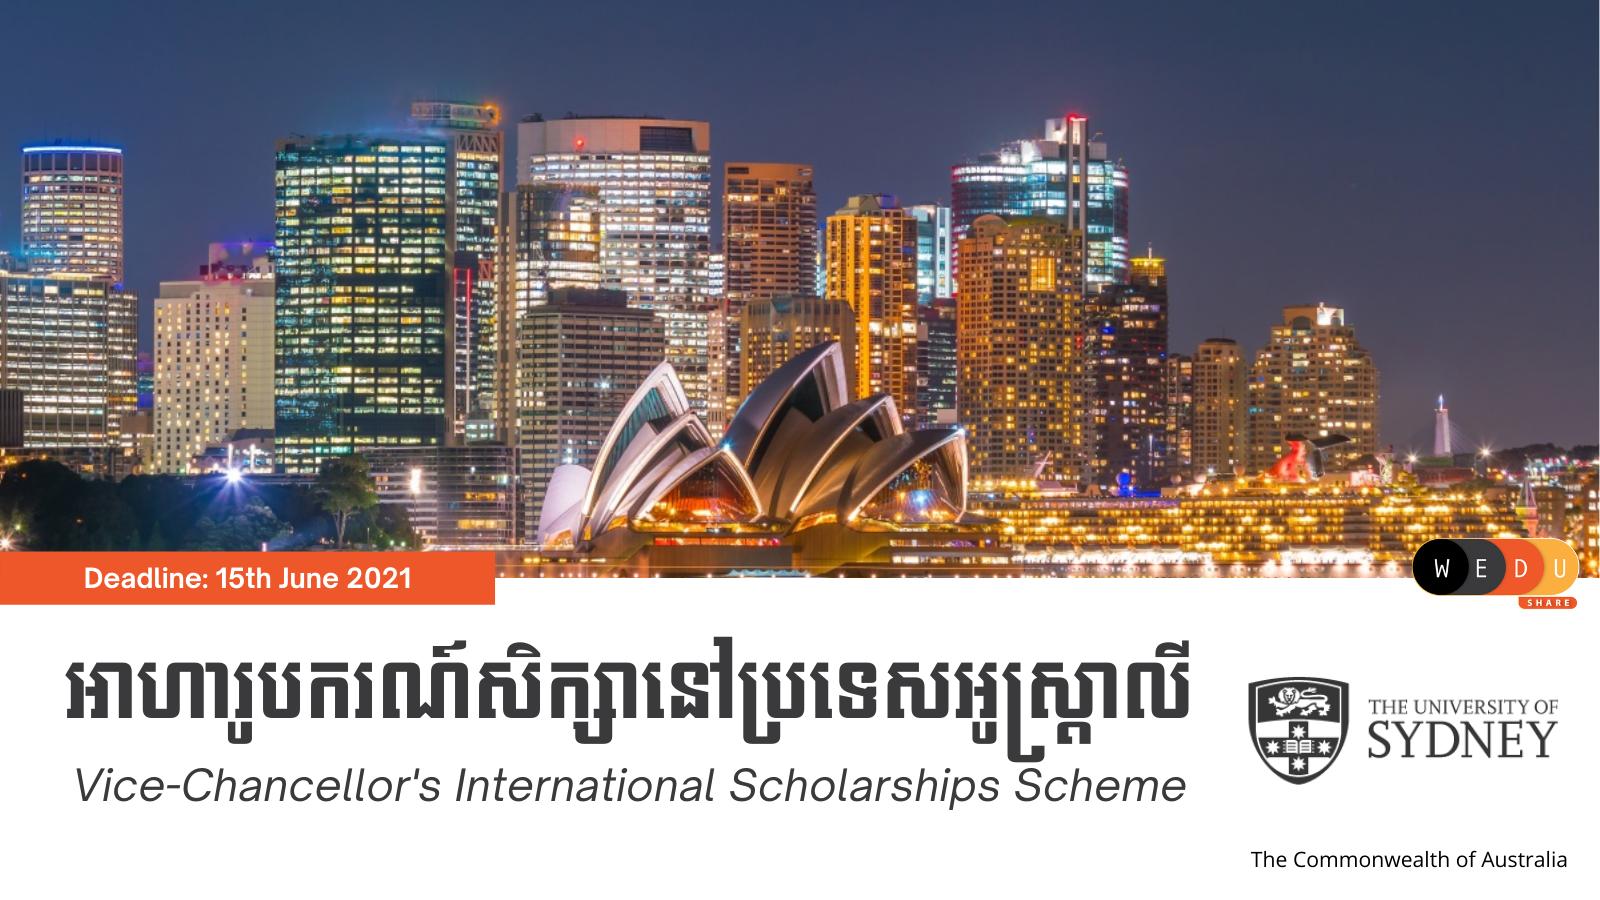 Vice-Chancellor's International Scholarships Scheme